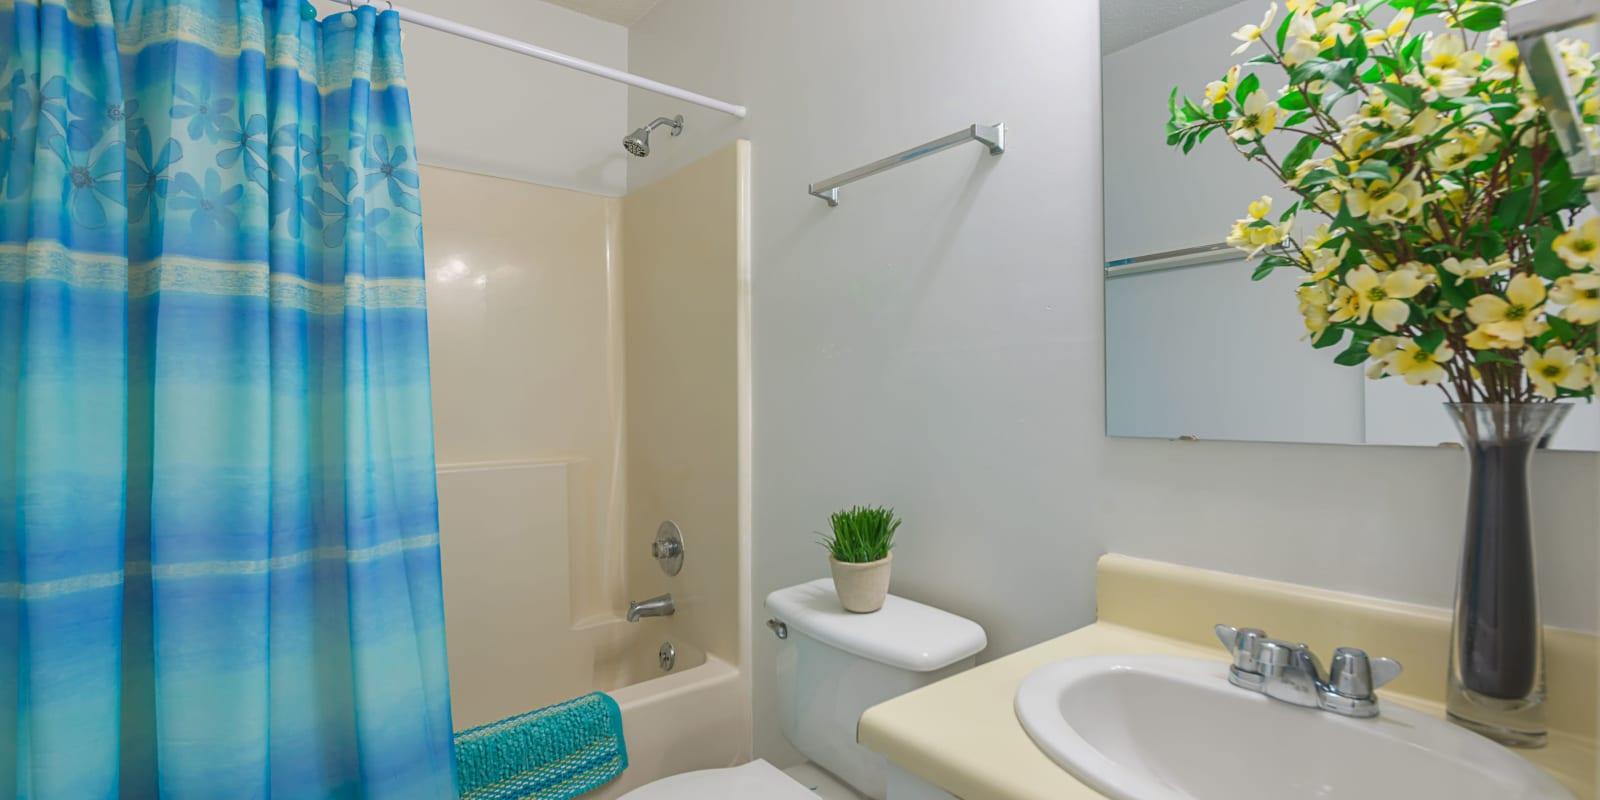 A bathroom with an oval tub at Lakewood Apartment Homes in Salisbury, North Carolina